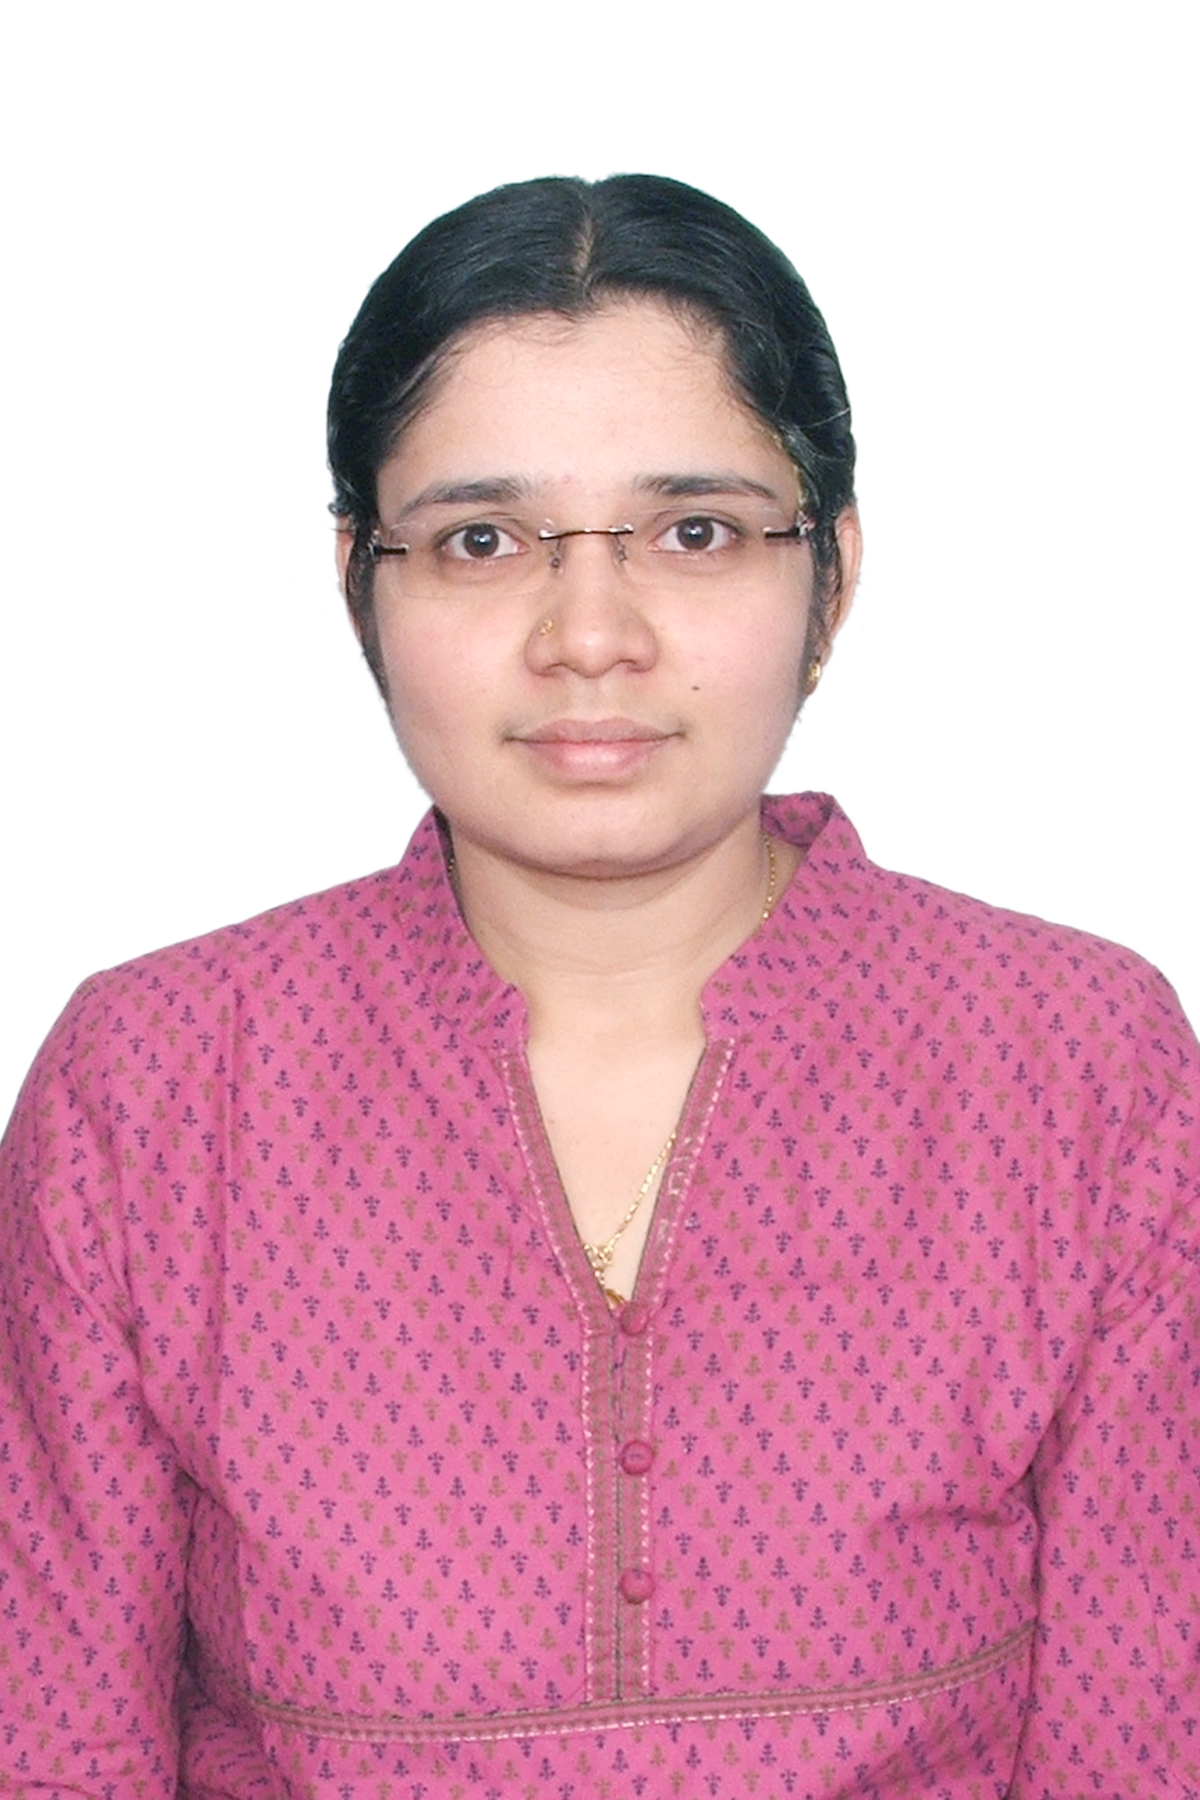 Lalitha Kodumudi Venkataraman